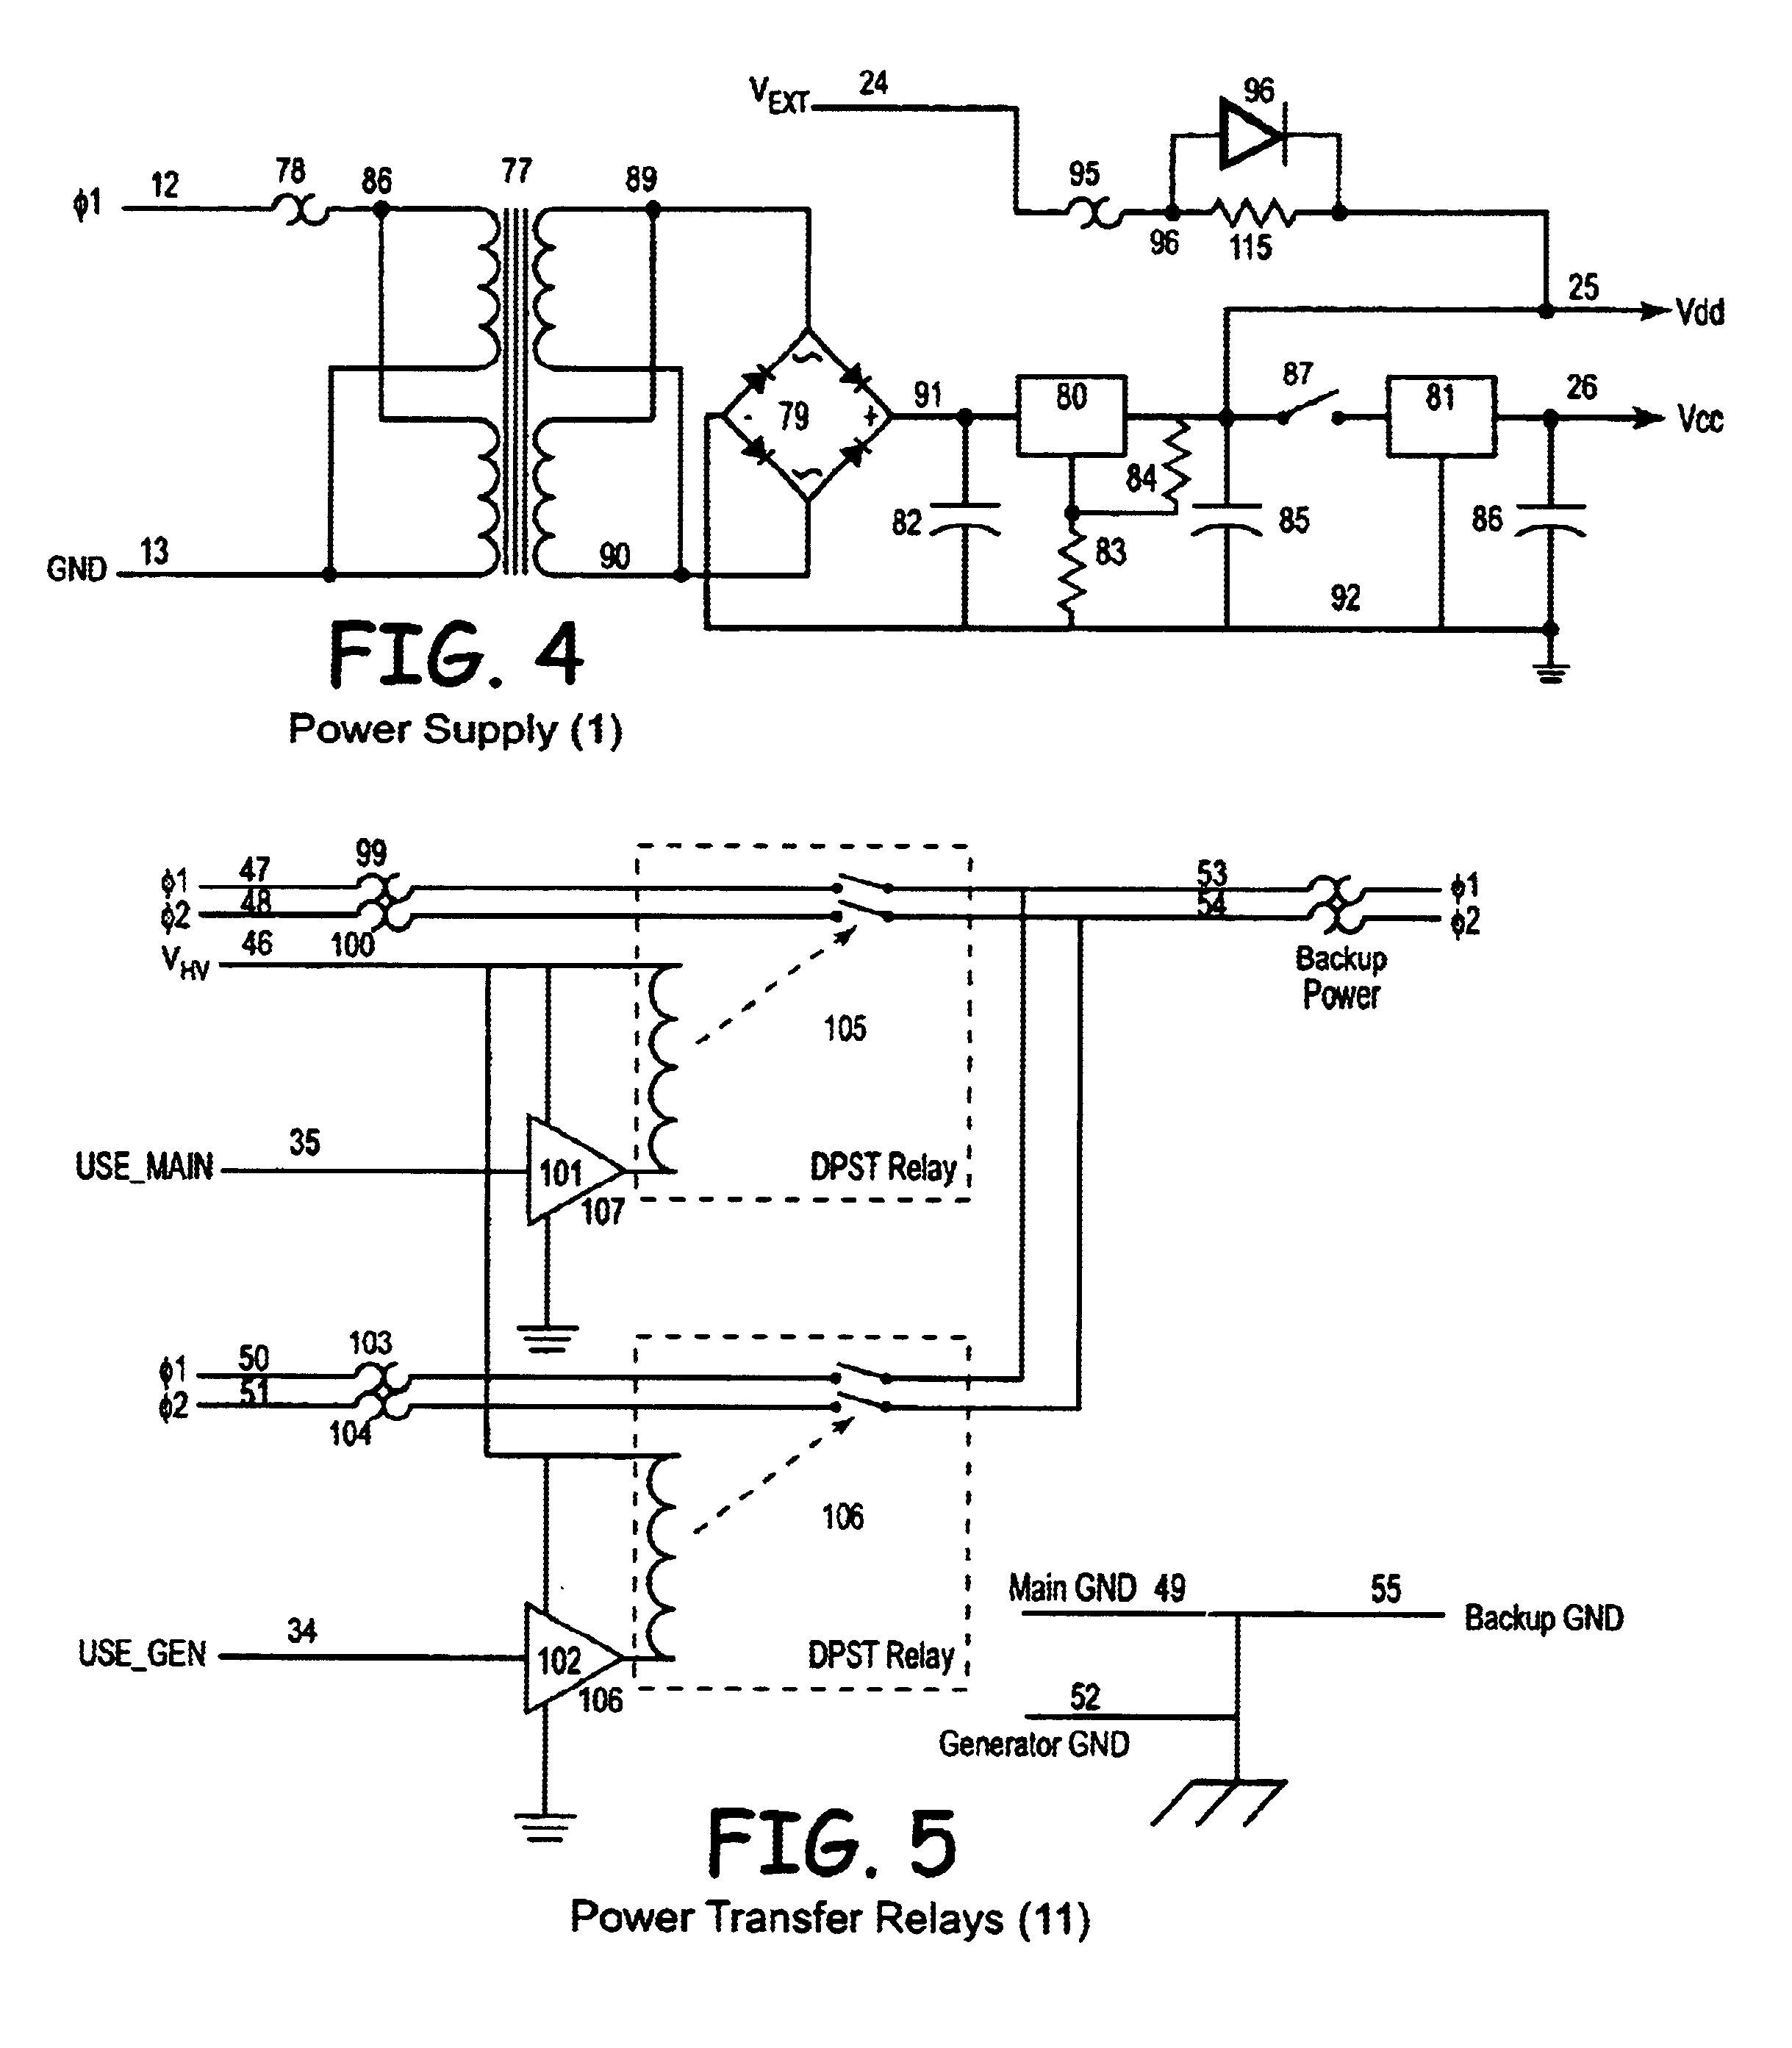 Directv Genie Wiring Diagram Elegant Great Directv Genie Wiring Diagram S Electrical and Wiring